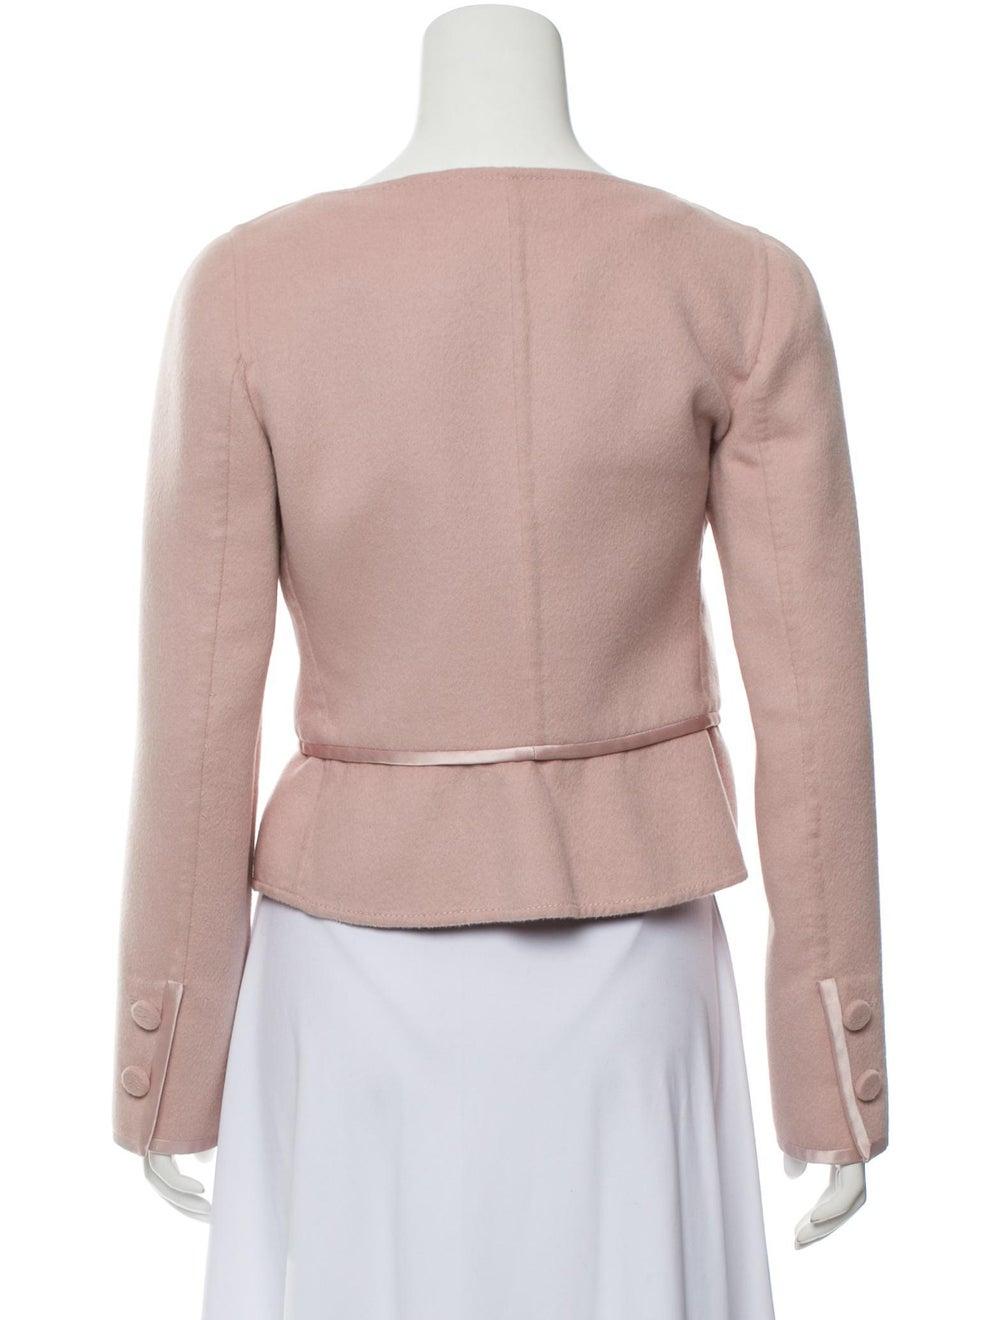 Valentino Wool Satin-Trimmed Jacket Pink - image 3